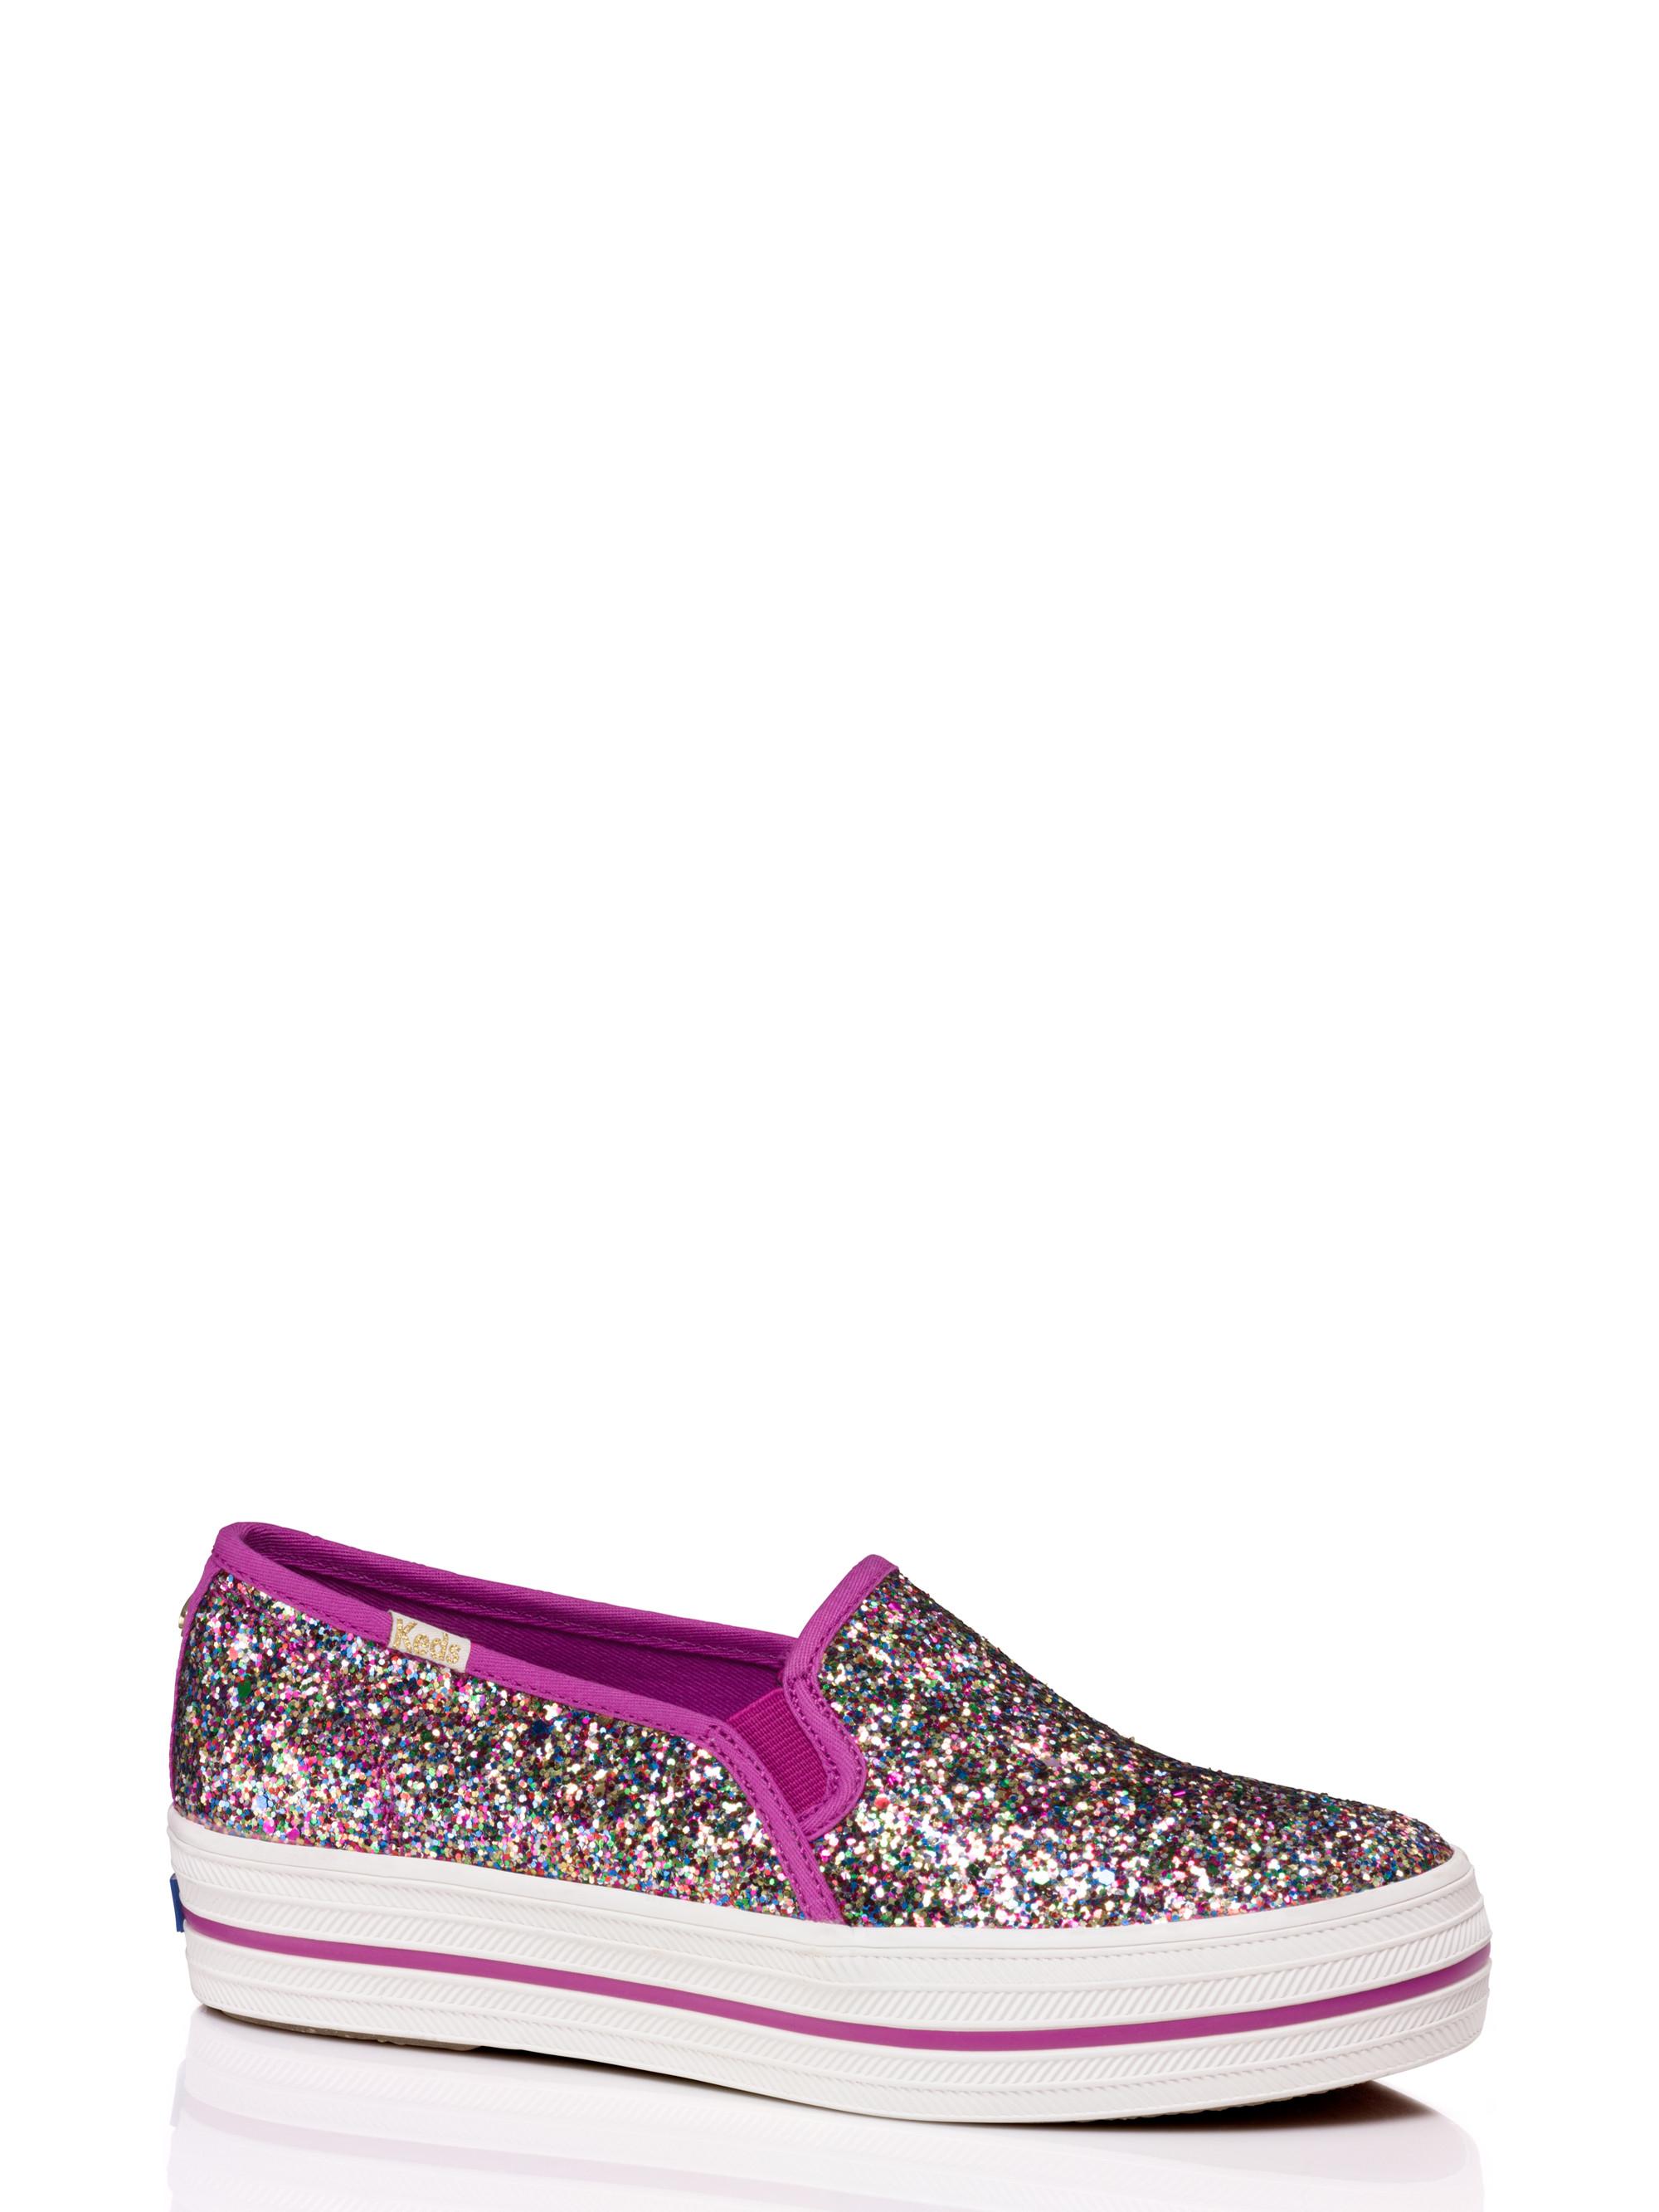 4b1d0bb3e8e81 Lyst - Kate Spade Keds For Decker Too Sneakers